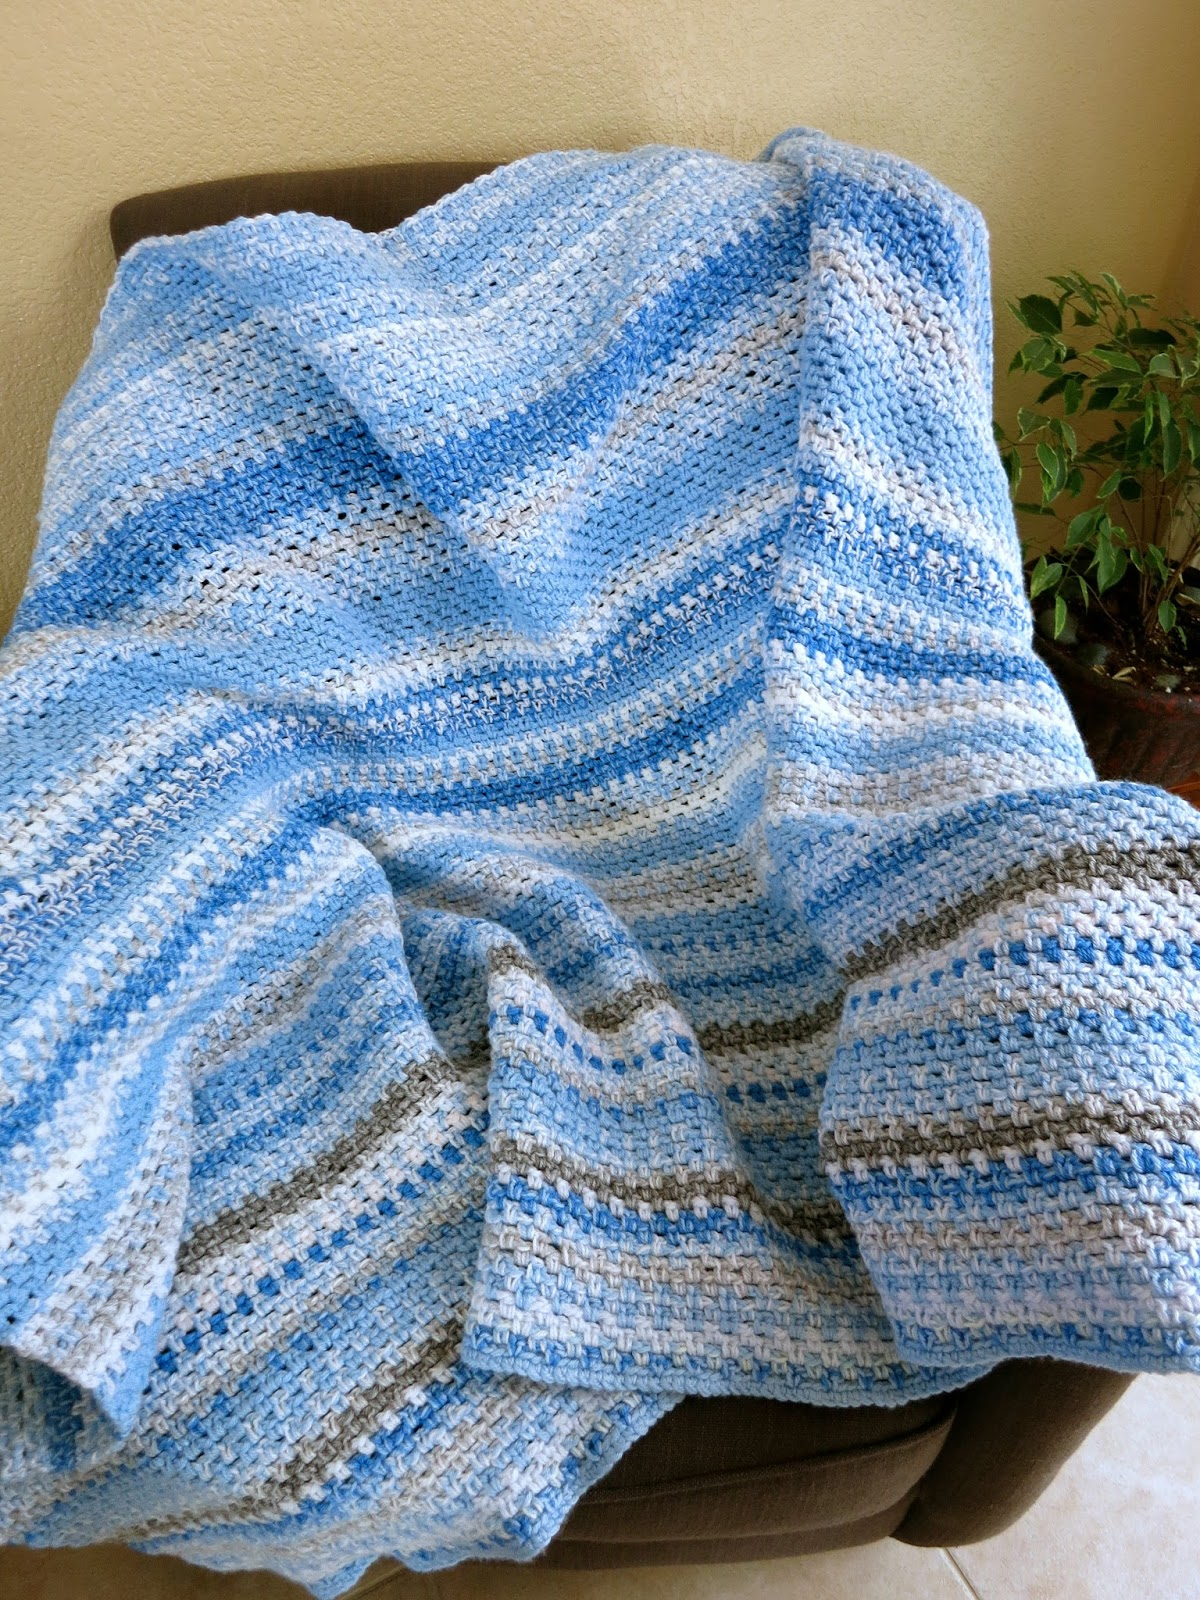 Da\'s Crochet Connection: Sky Blanket Update-May 2015